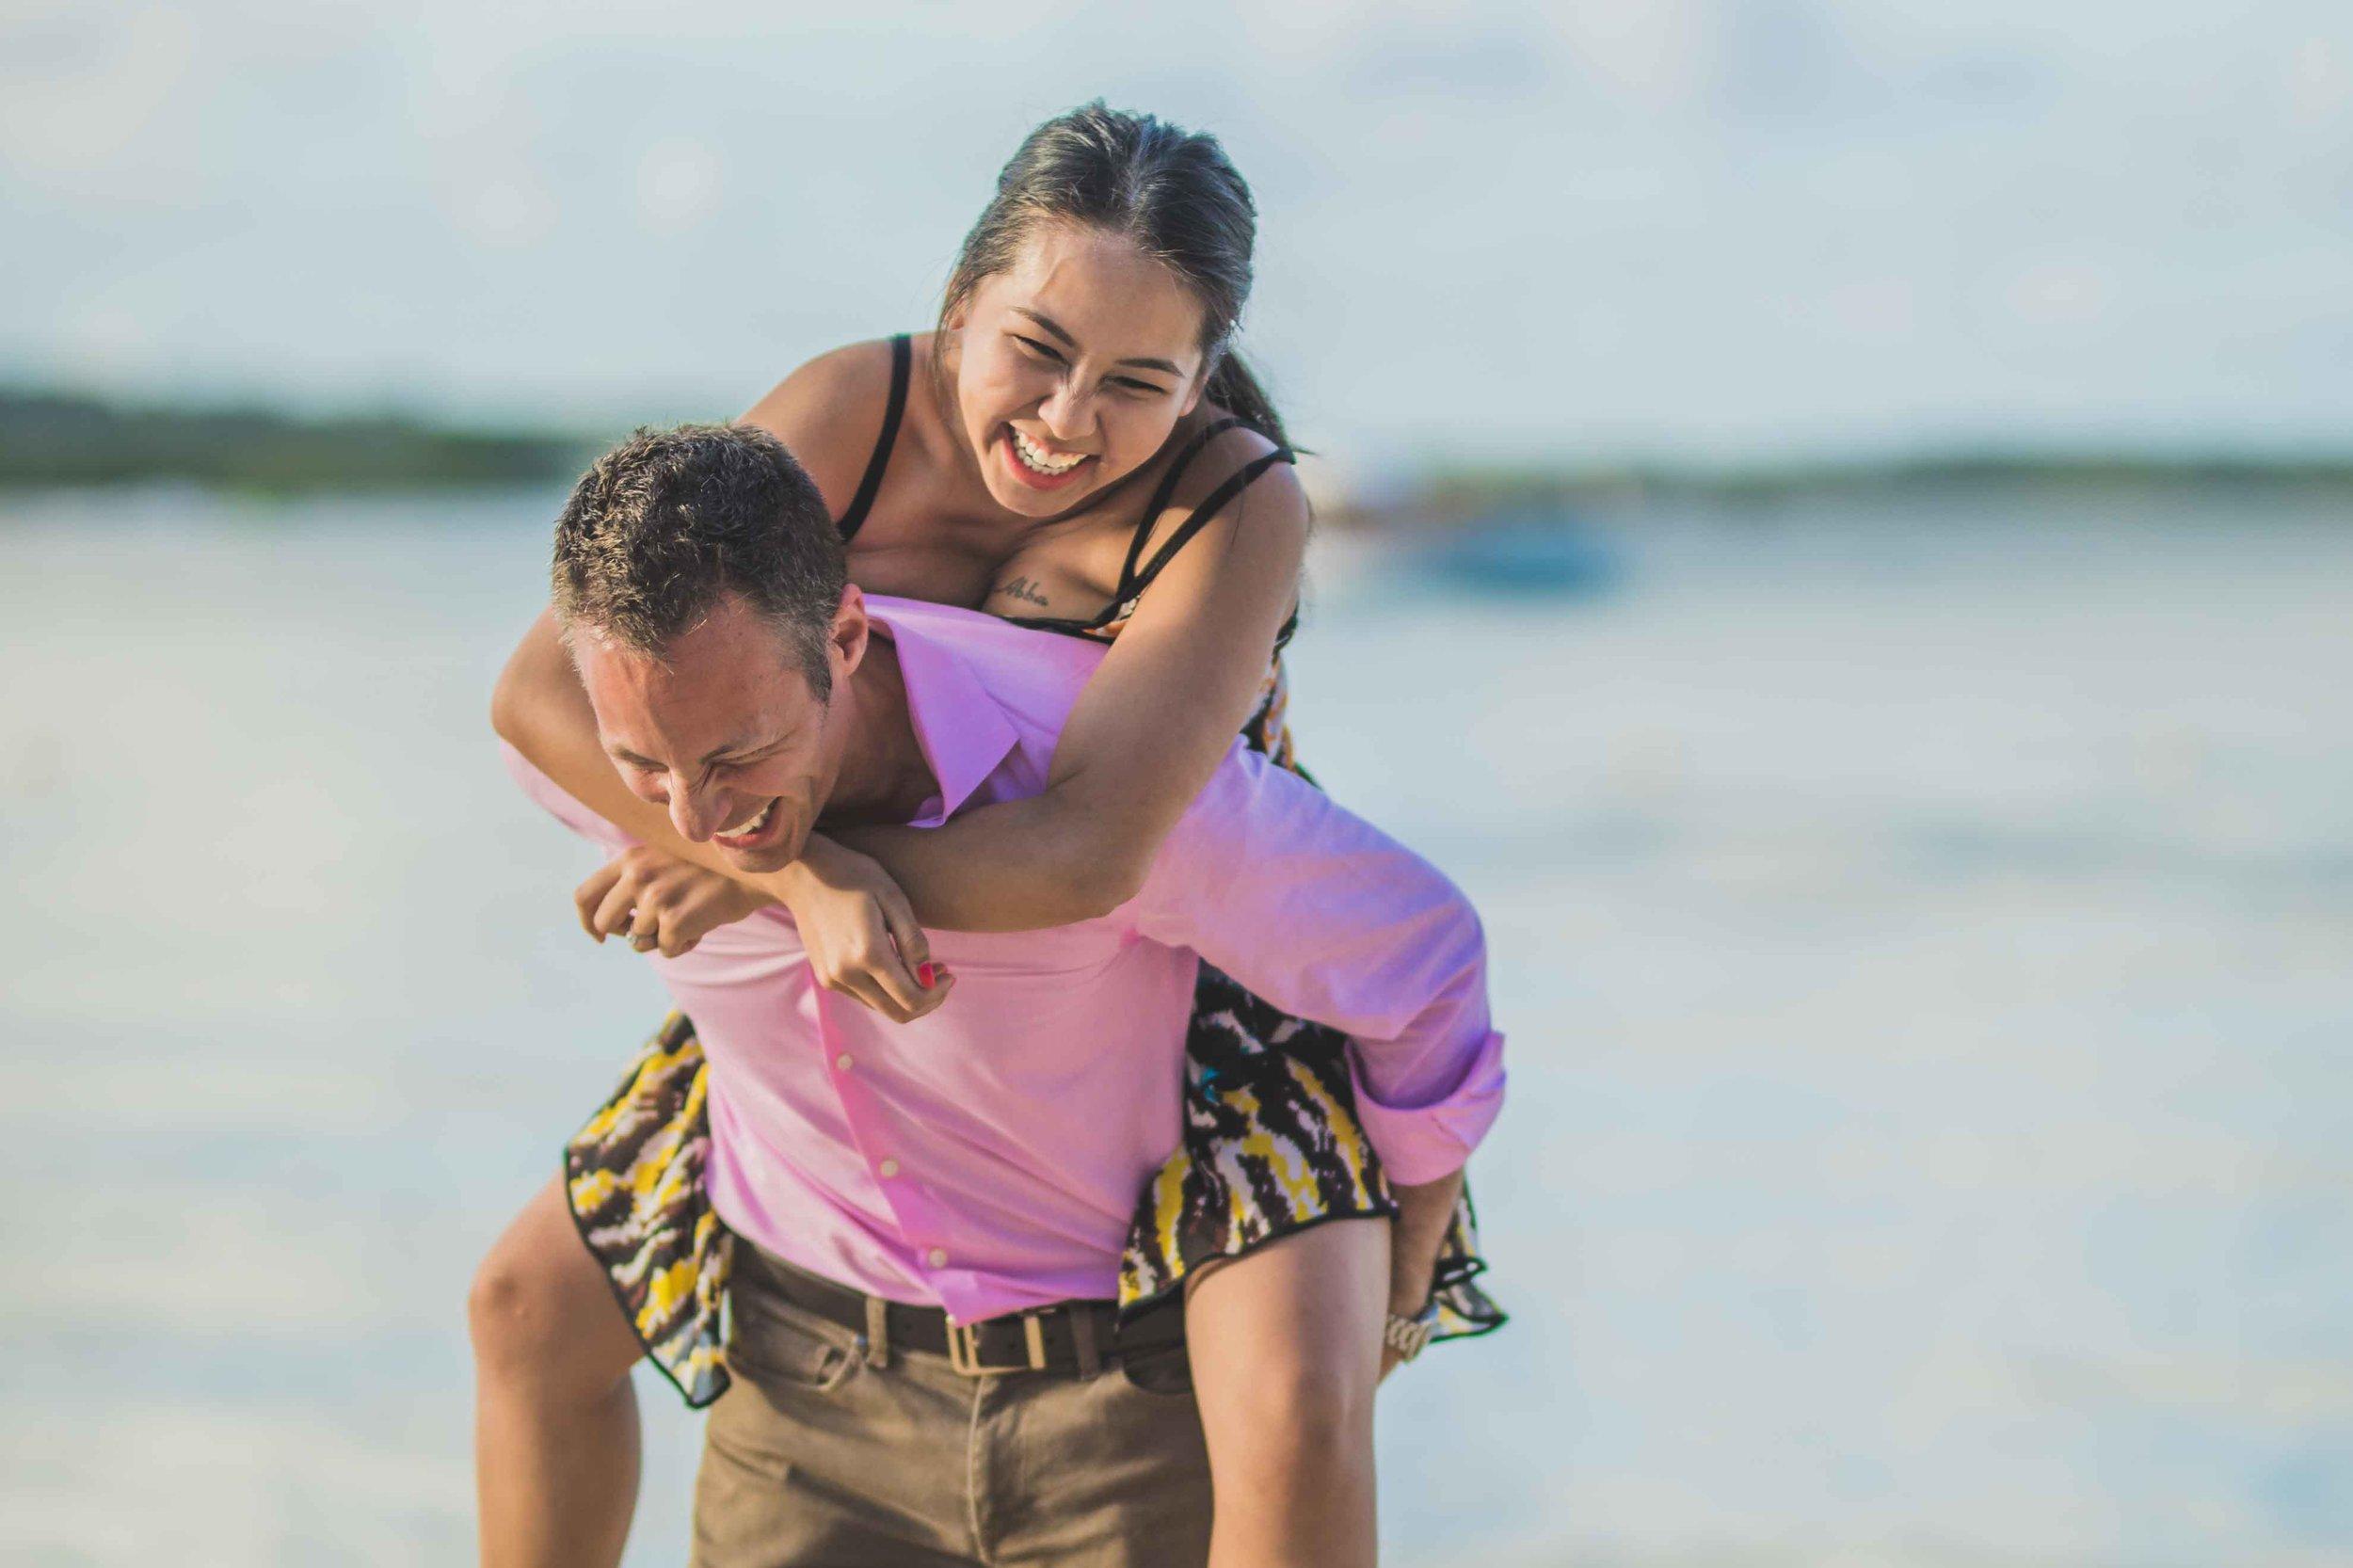 Wife on husband's back laughing on honeymoon